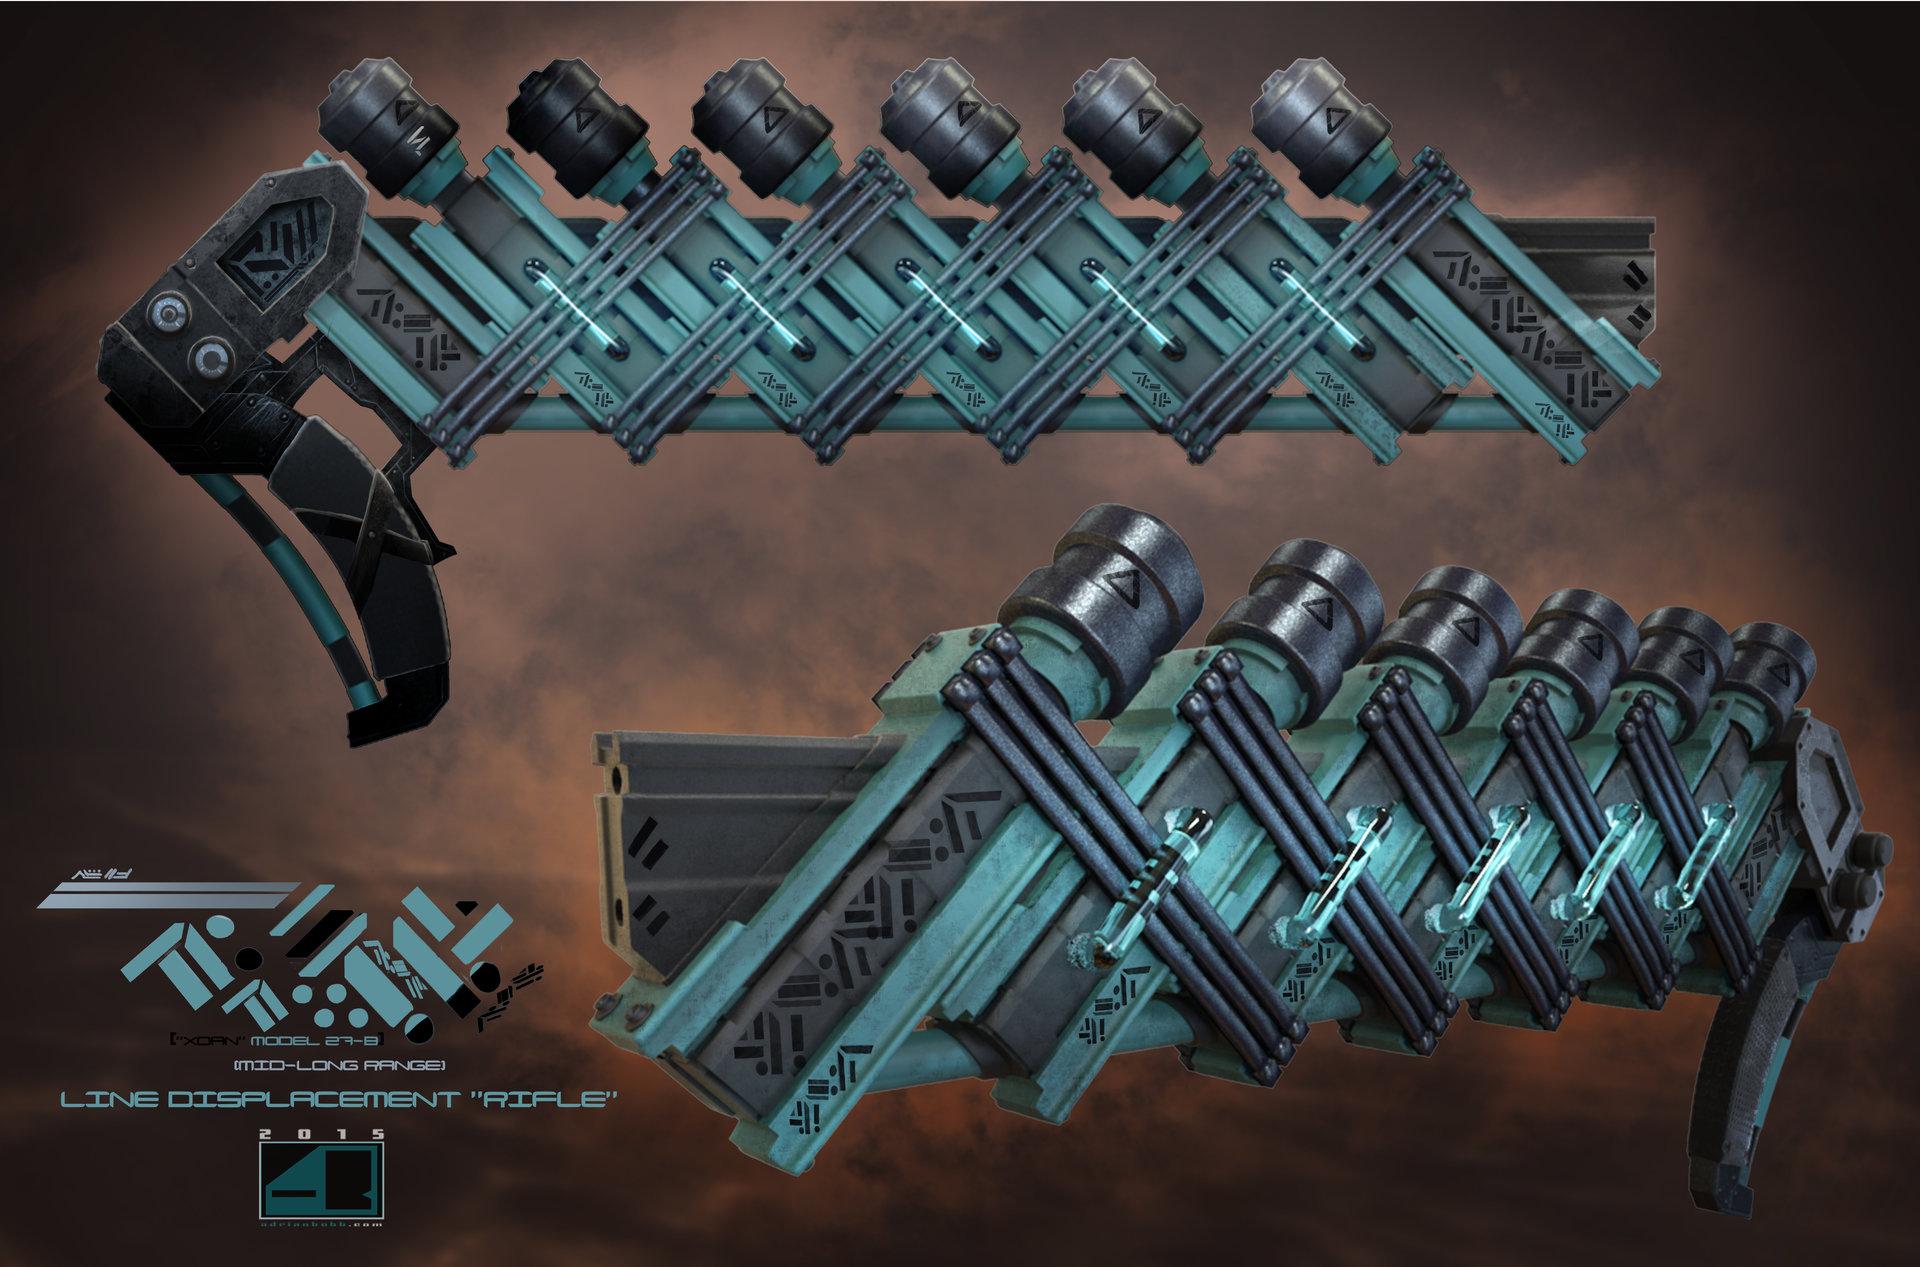 Alien Rifle Design